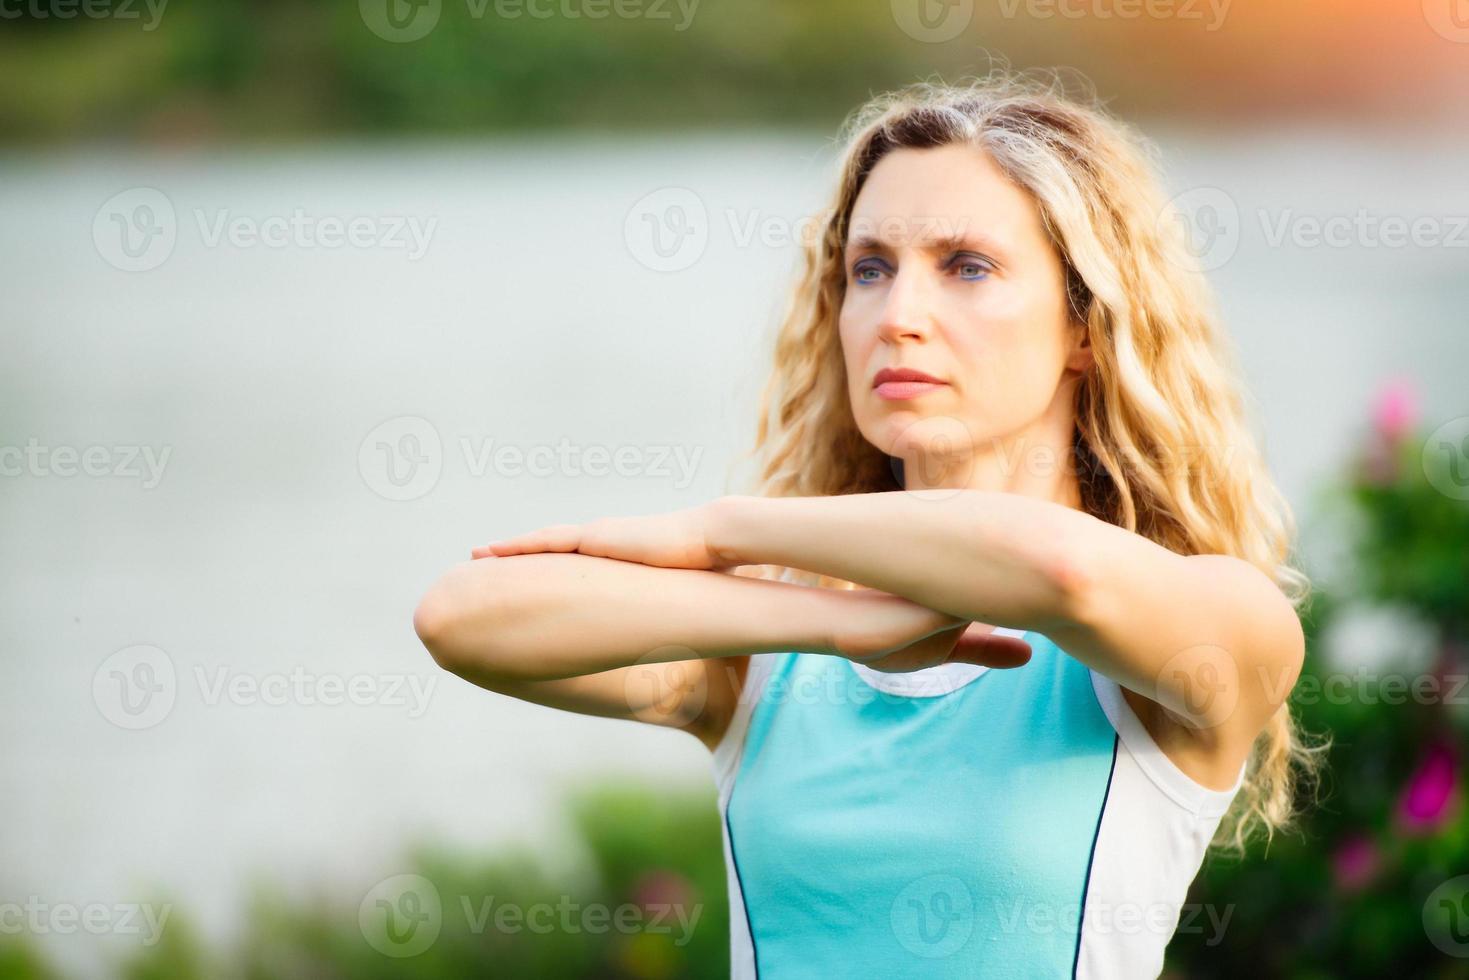 Yoga. junge Frau, die Yogaübung im Freien macht foto